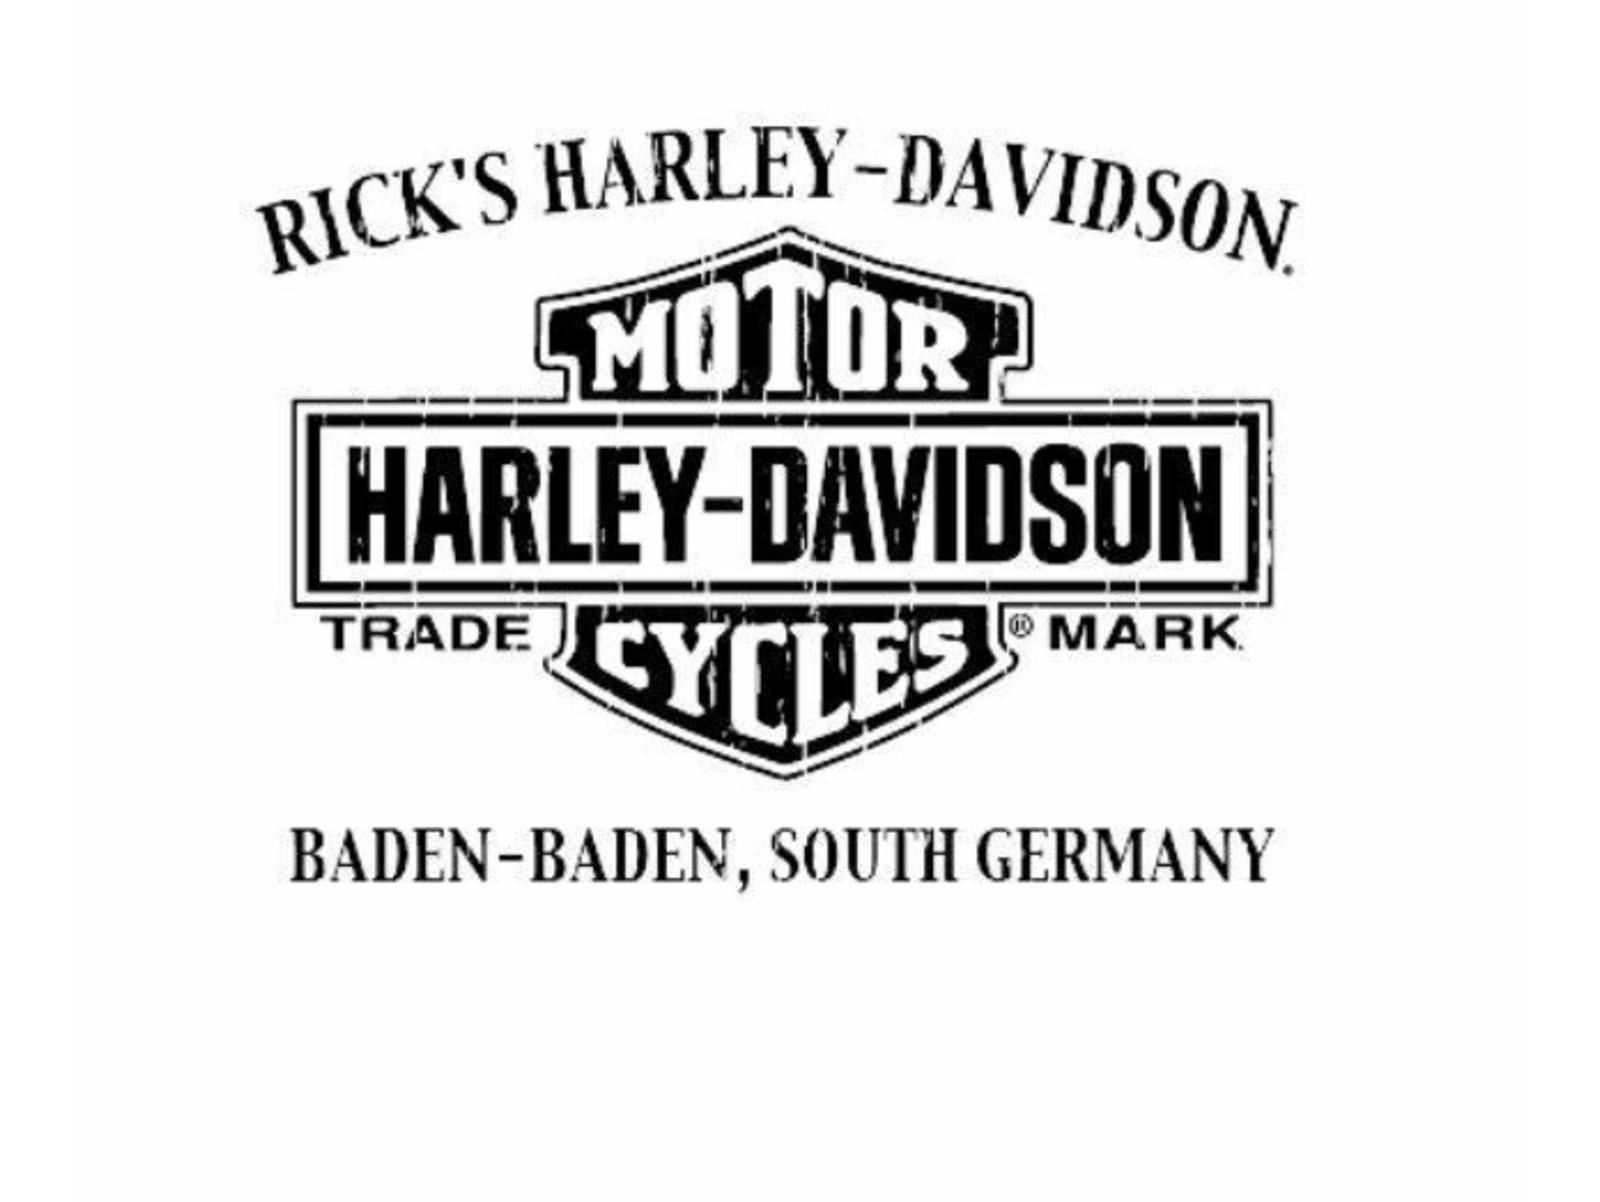 ricks harley davidson defiant rangers dealer men s t shirt 5l33 hh37 tee